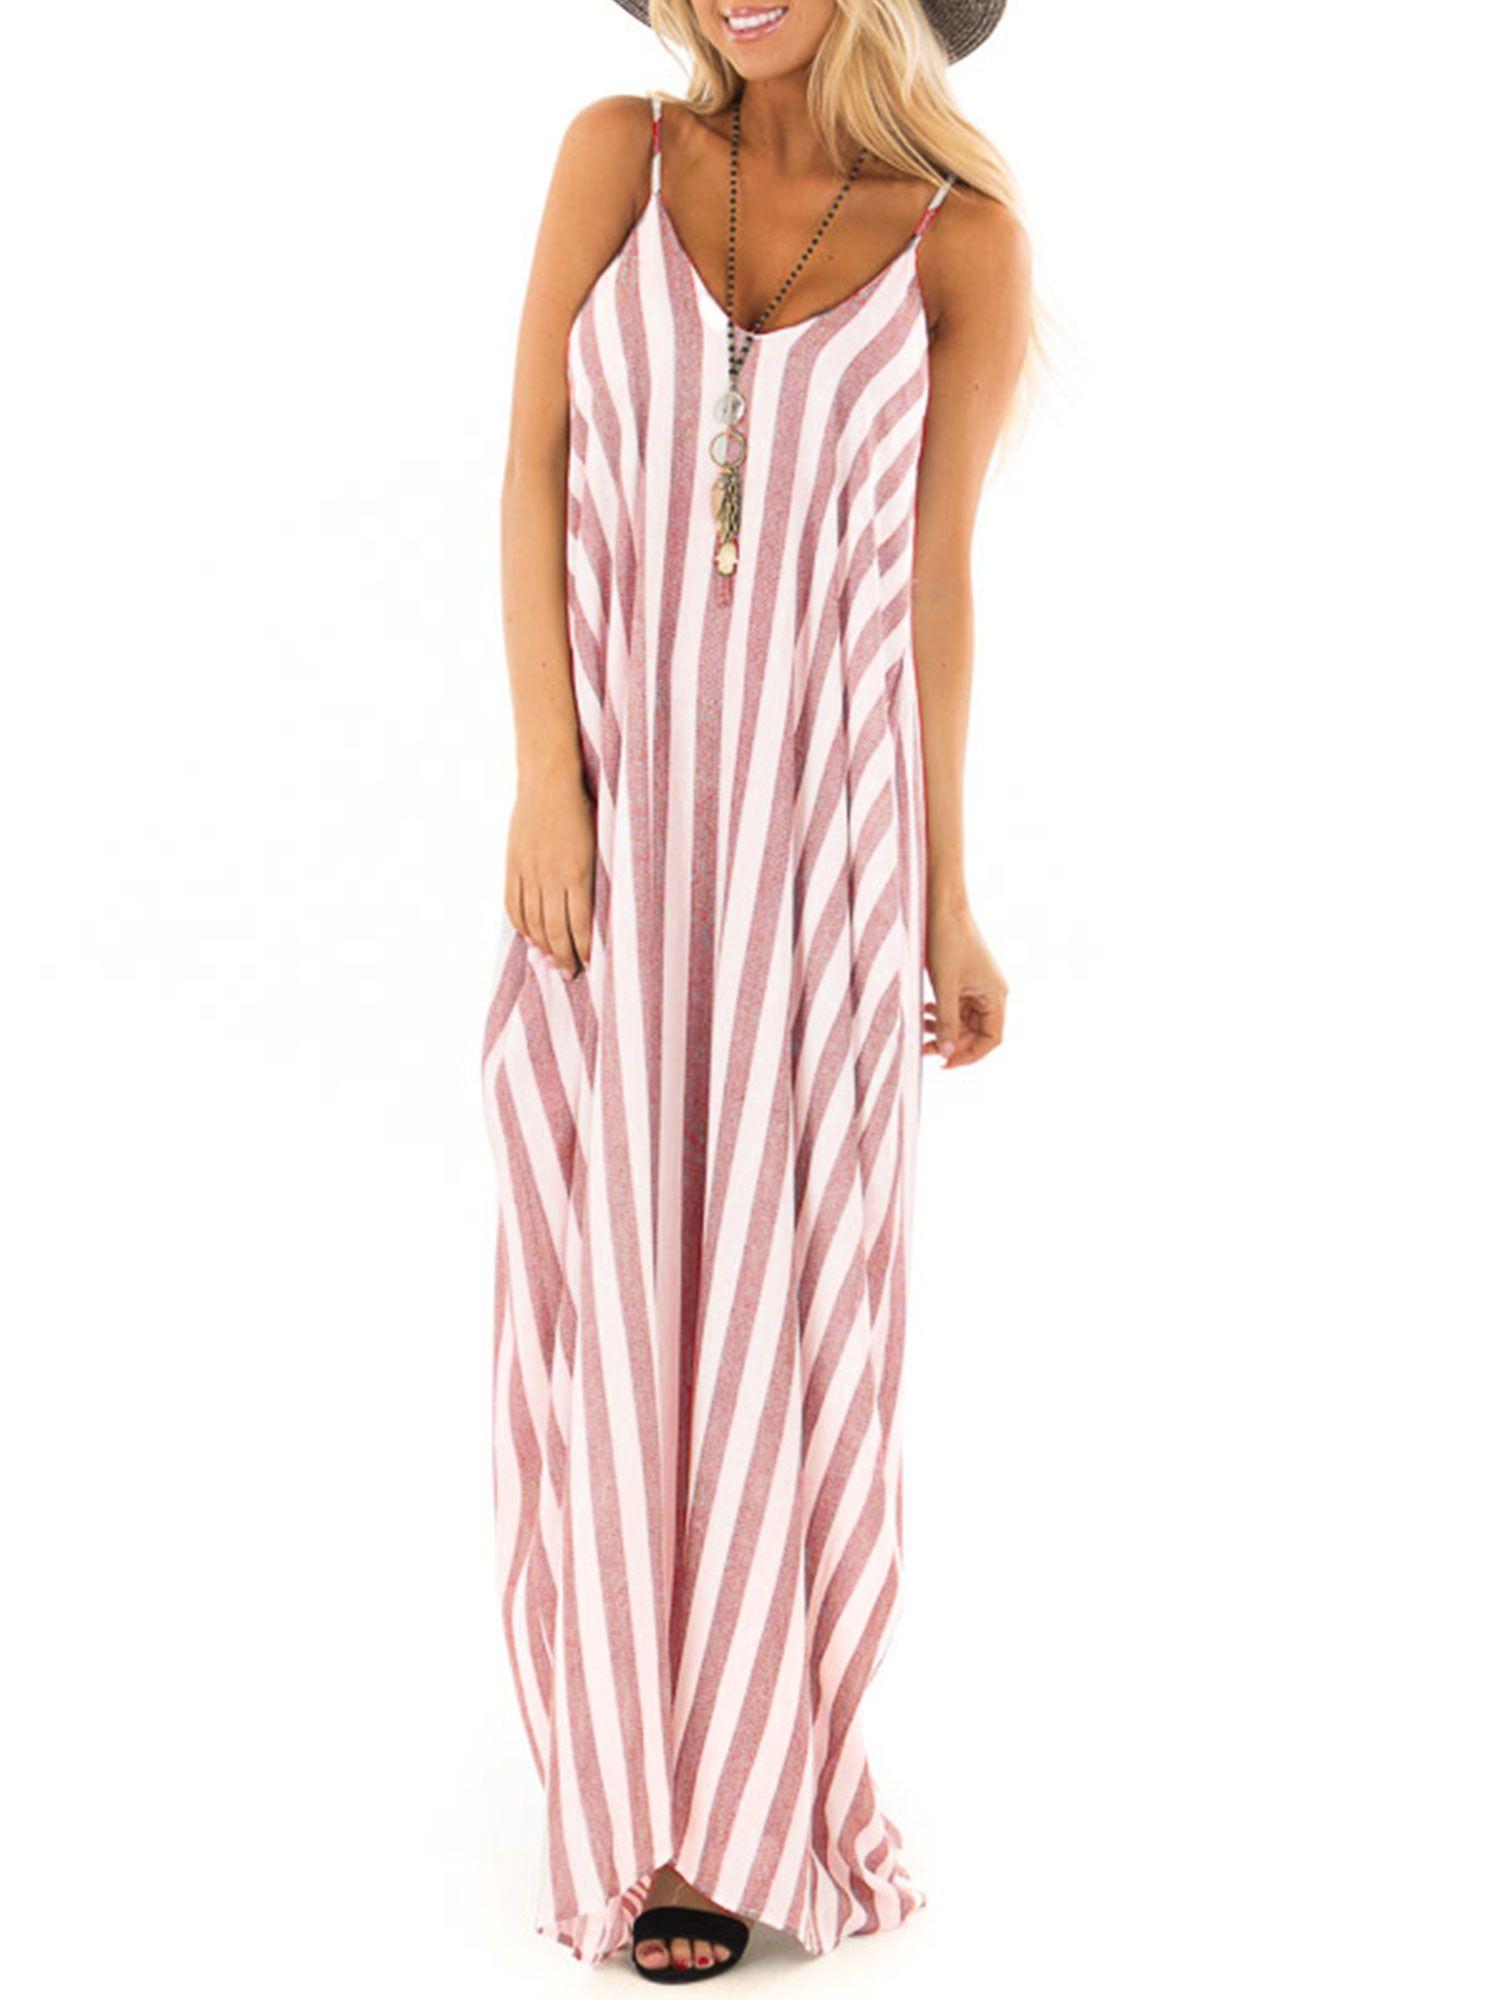 Himone Summer Holiday Women Strappy Cami Striped Long Boho Dress Ladies Beach Maxi Sundress Walmart Com Long Summer Dresses Boho Summer Dresses Boho Dresses Long [ 2000 x 1500 Pixel ]